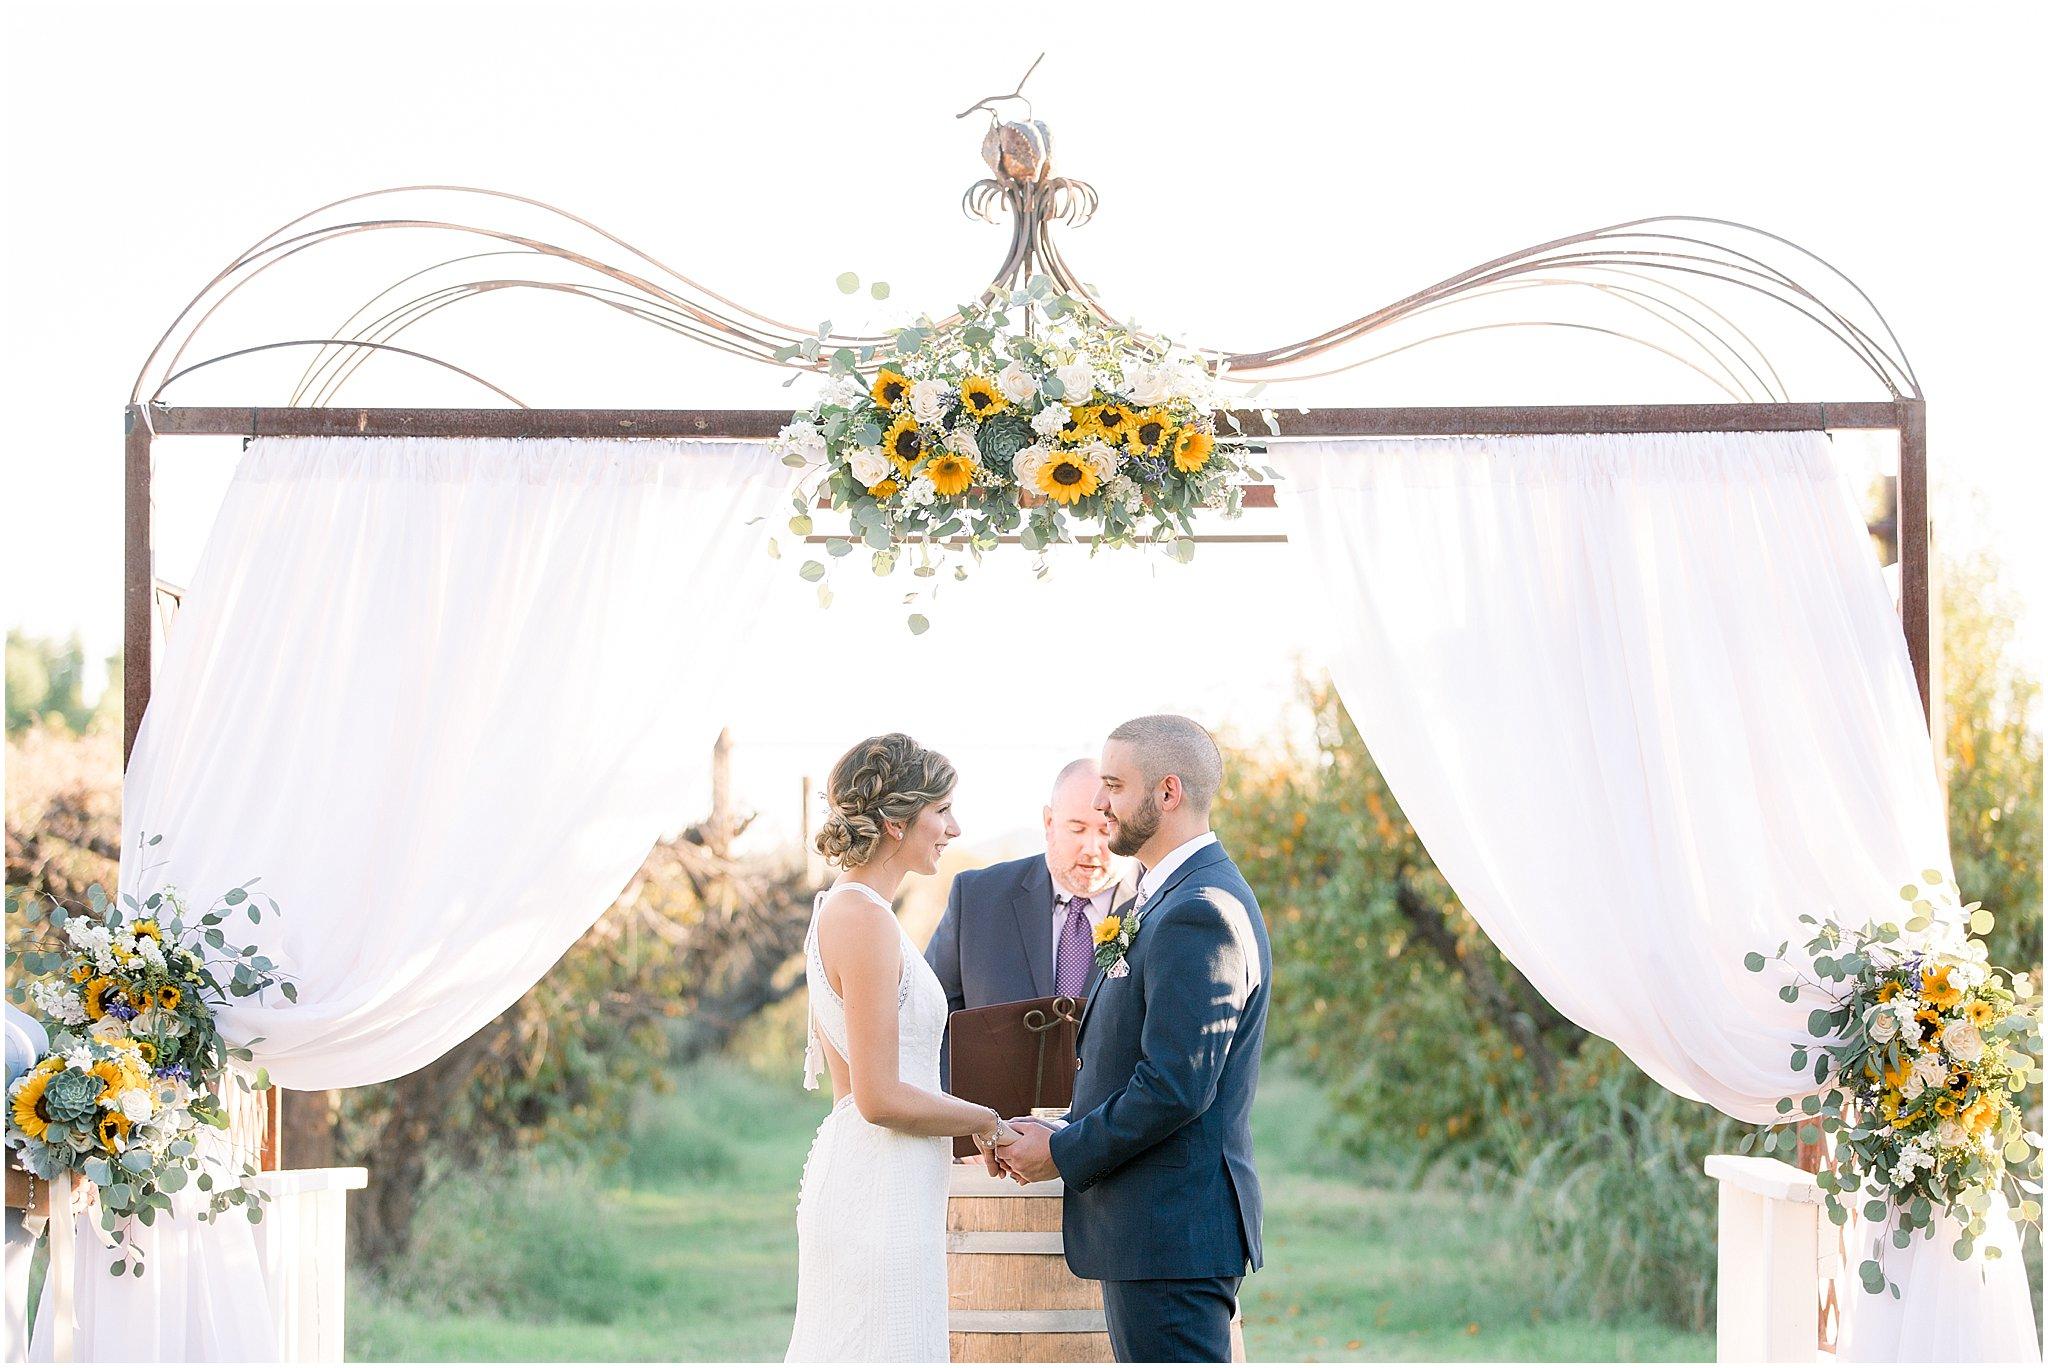 Hyatt-Lodge-Mcdonald-Campus-Wedding_0134.jpg